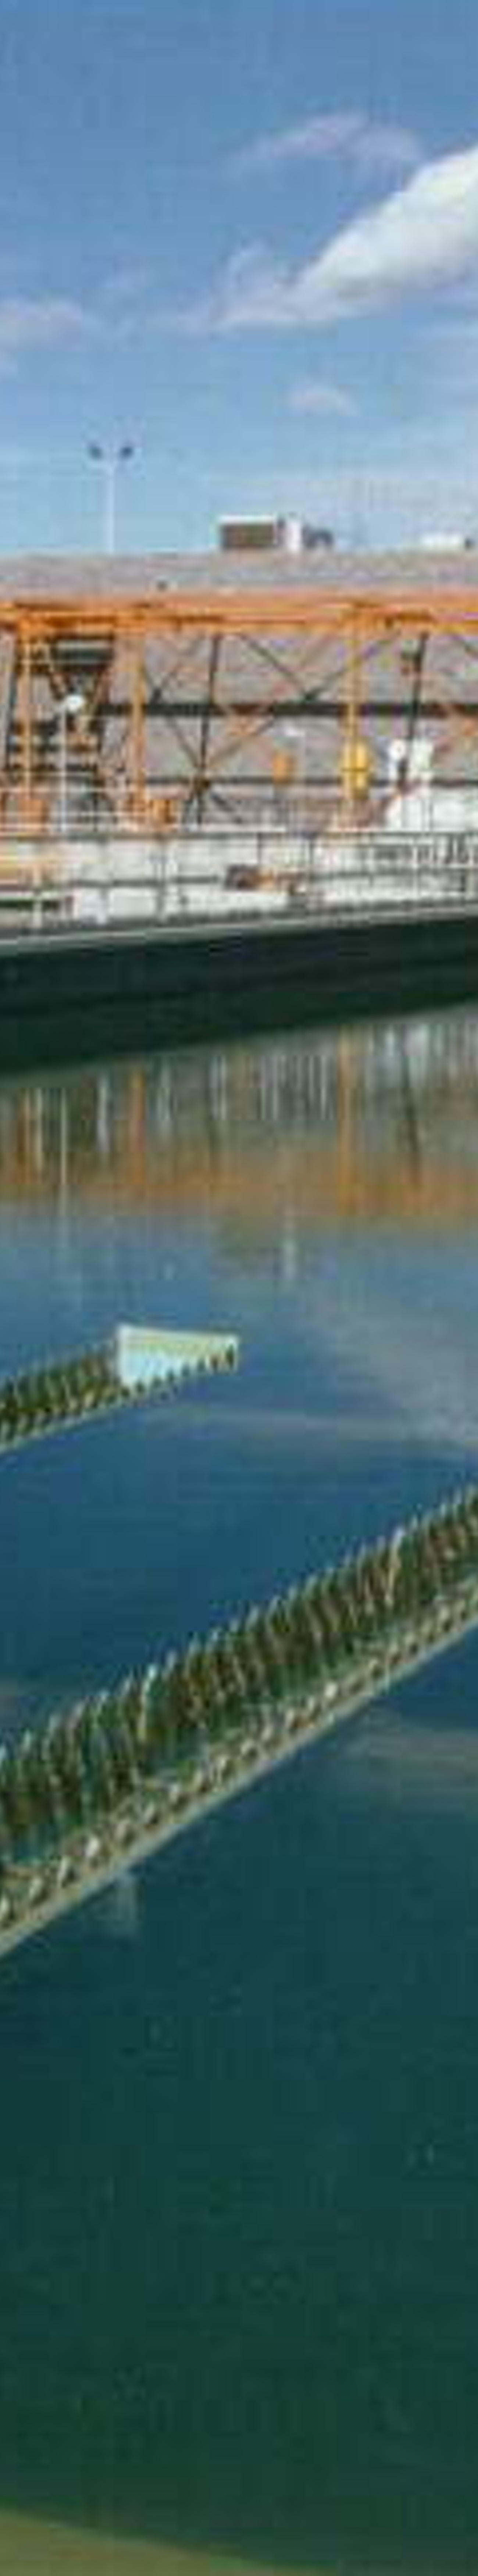 Jonathan Rogers Water Treatment Plant